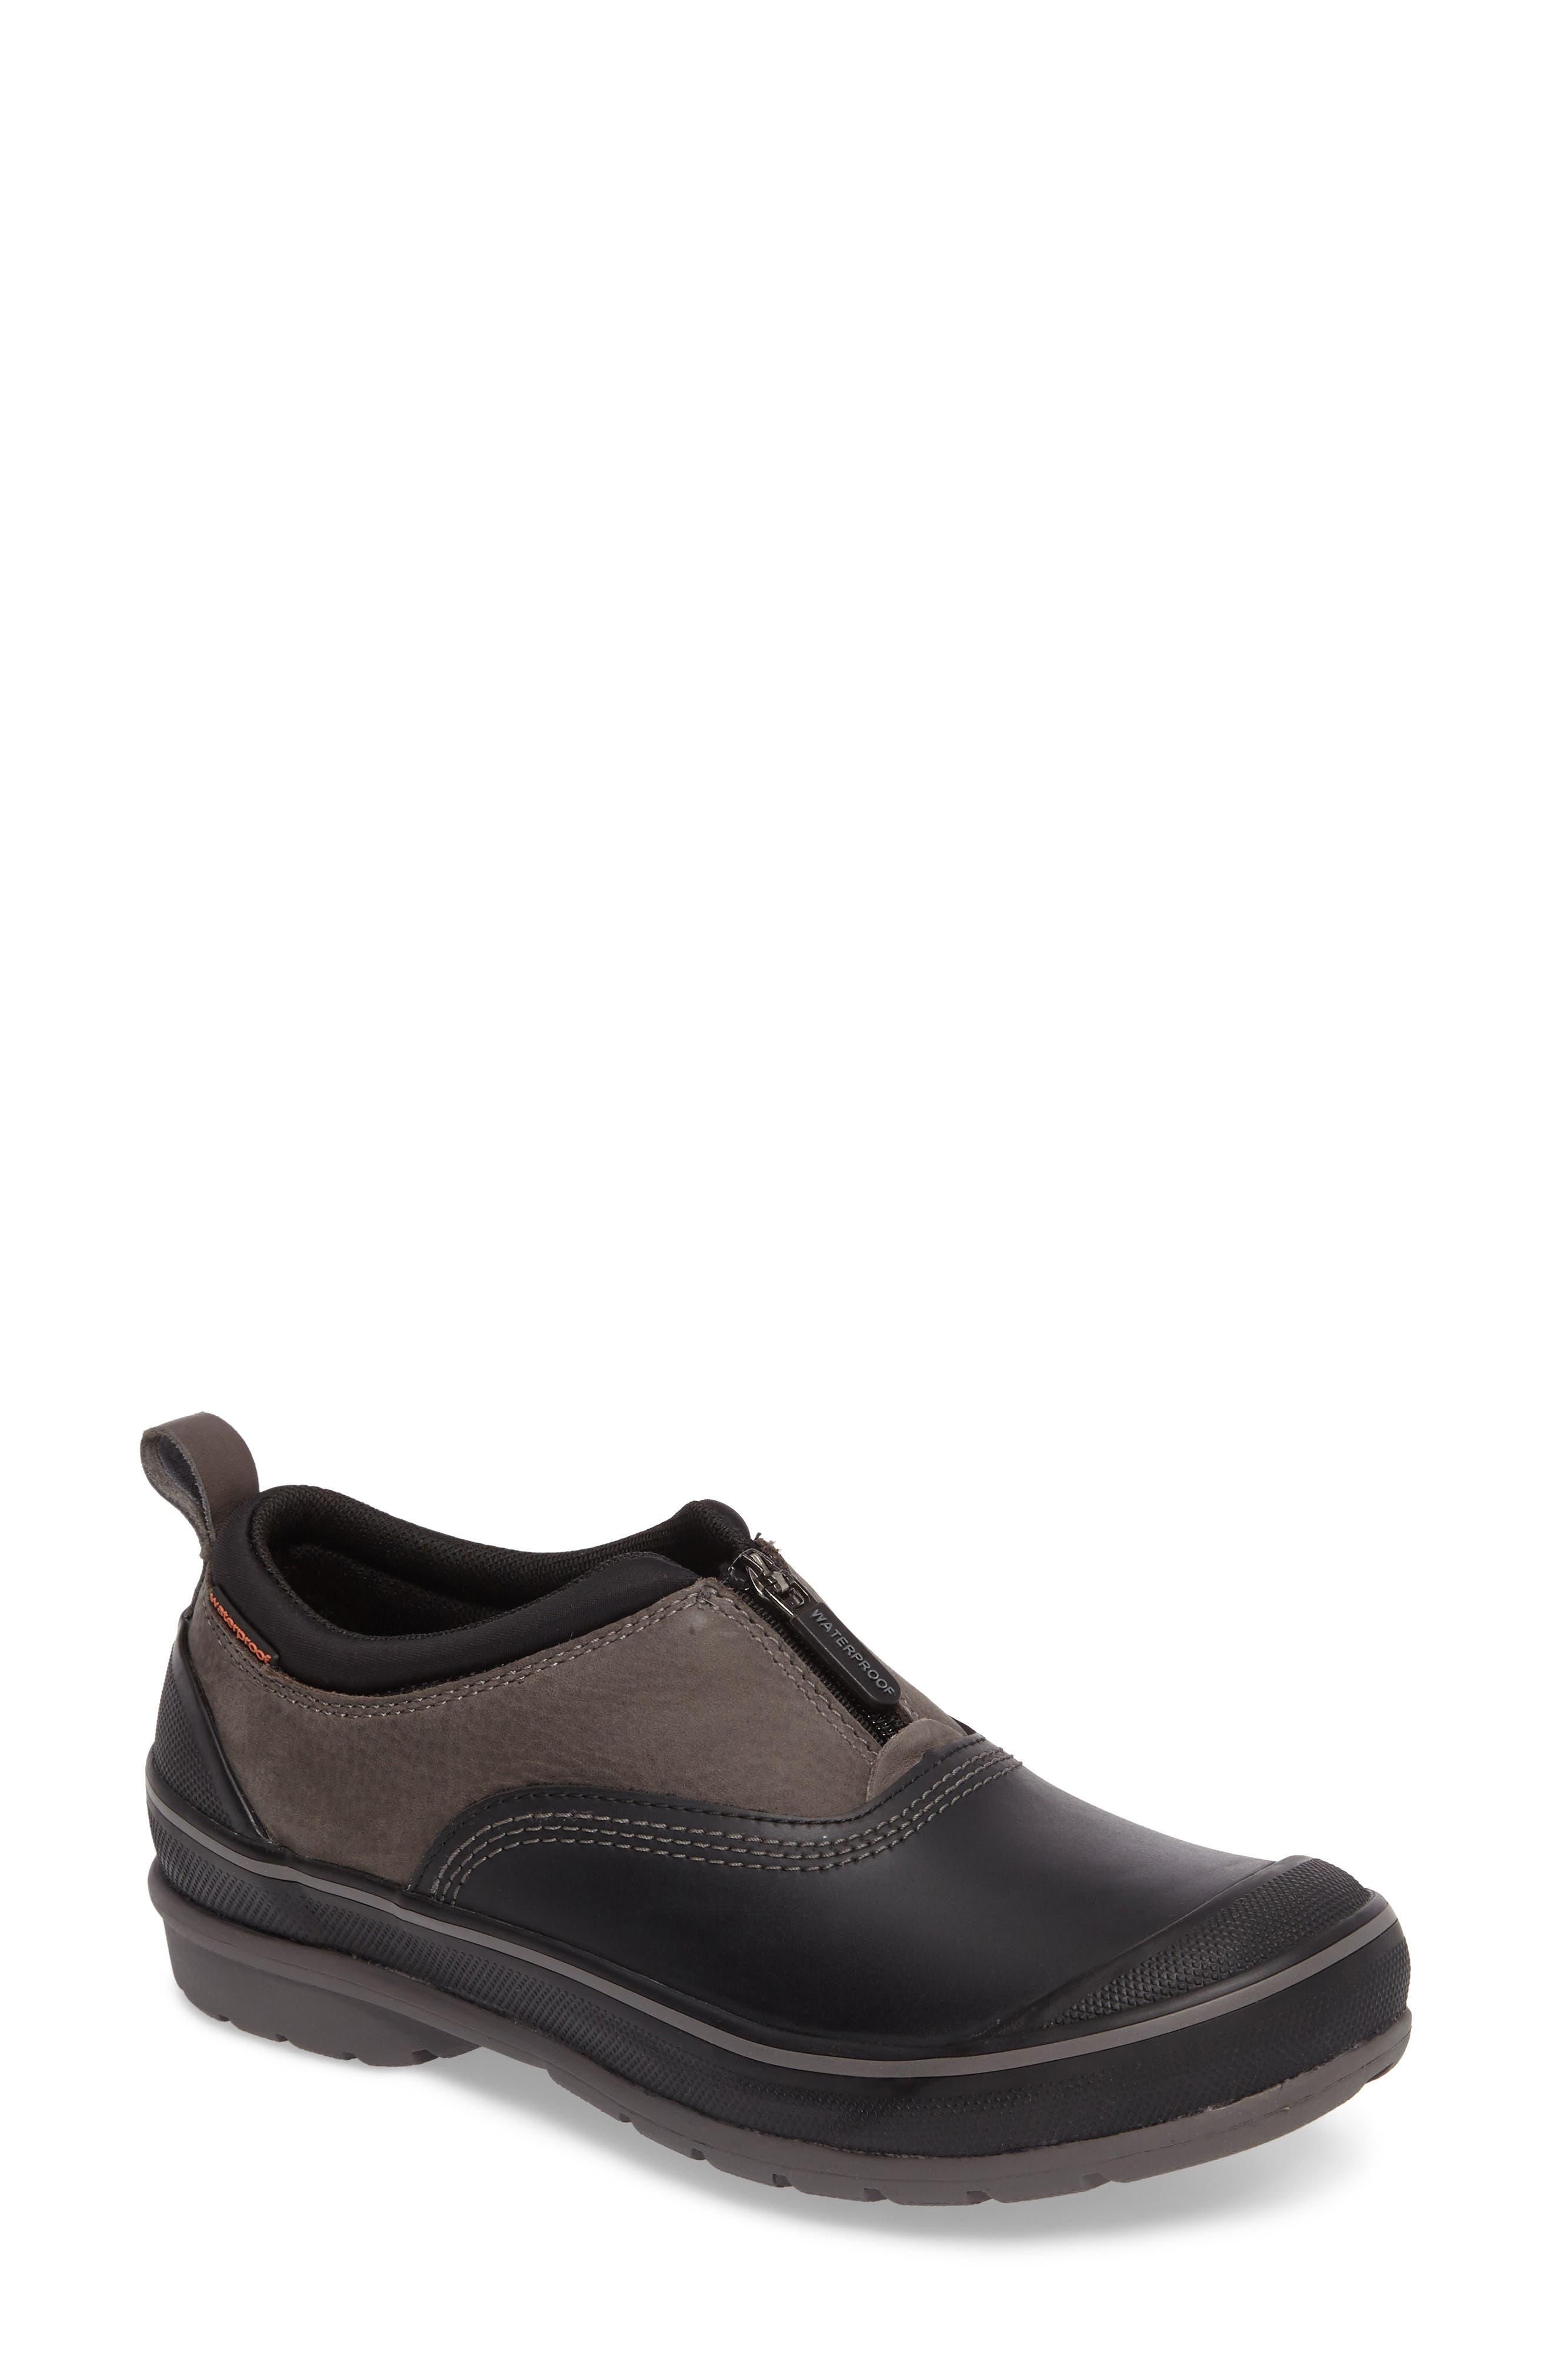 Alternate Image 1 Selected - Clarks® Muckers Trail Waterproof Boot (Women)